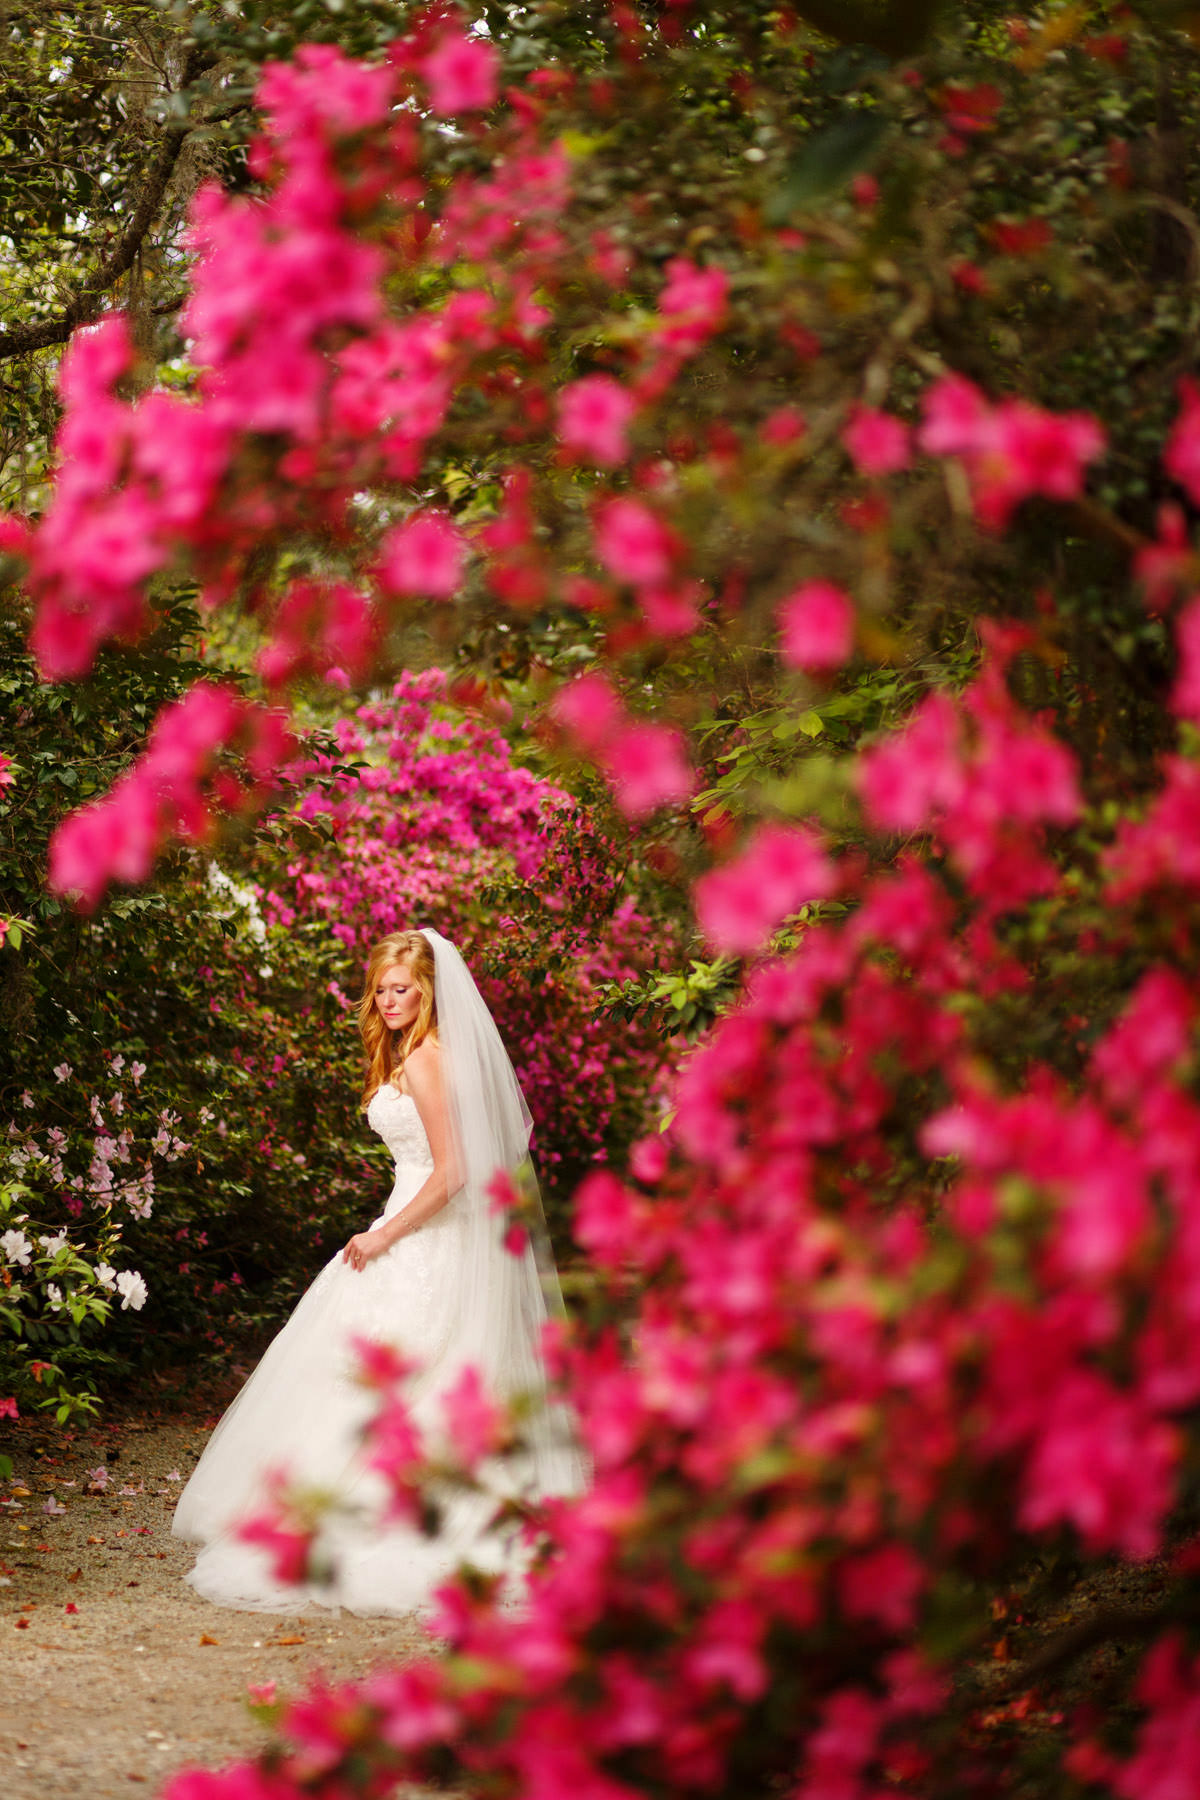 rm_brown_wedding_146as